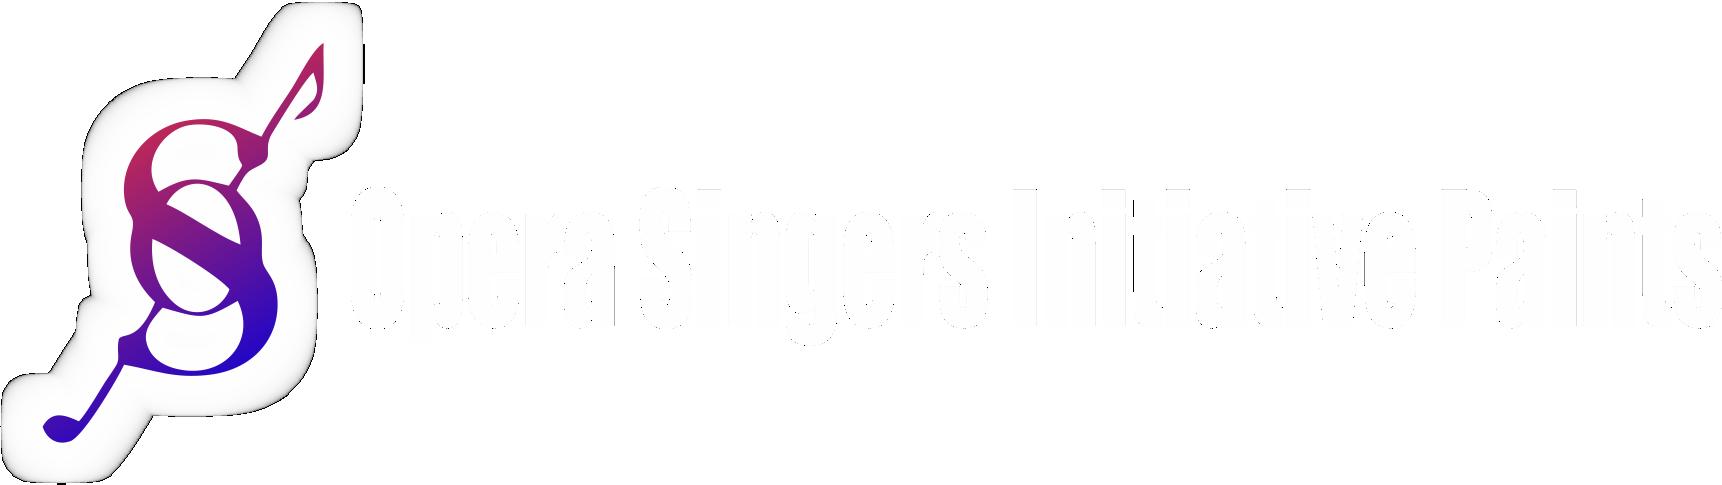 Opera Singers Initiative Paints